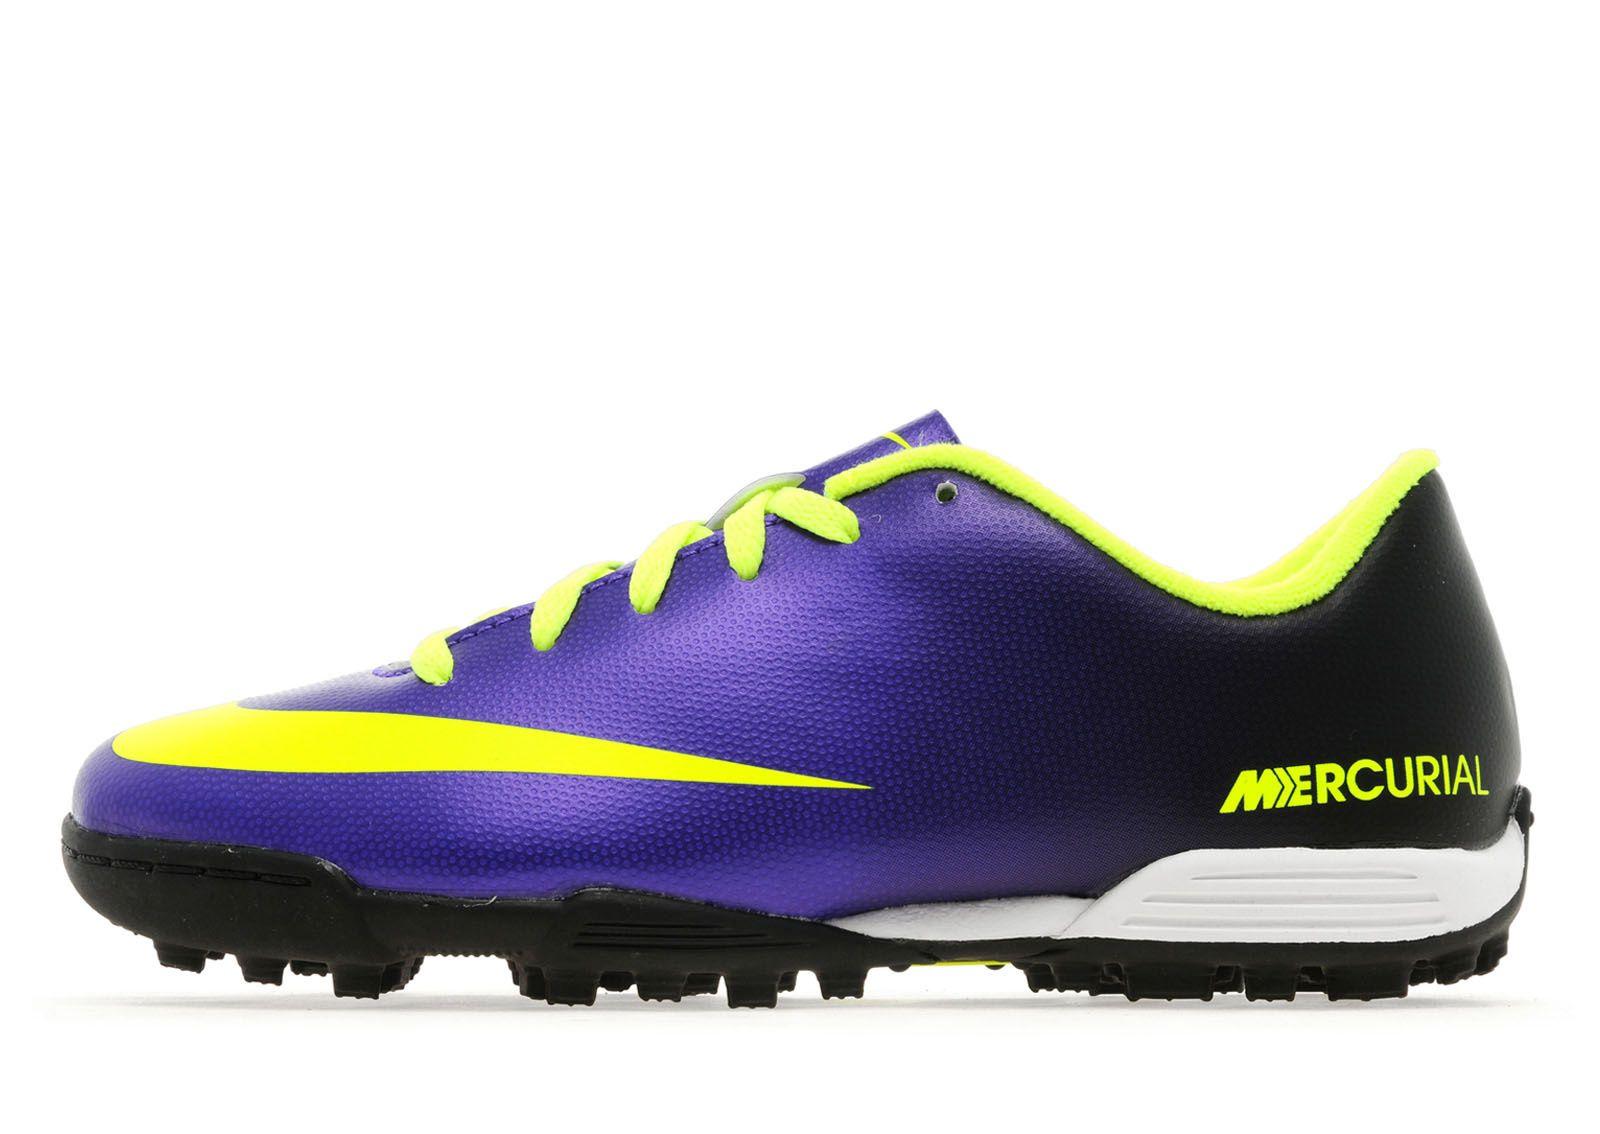 Nike Mercurial Vortex Astro Turf Childrens